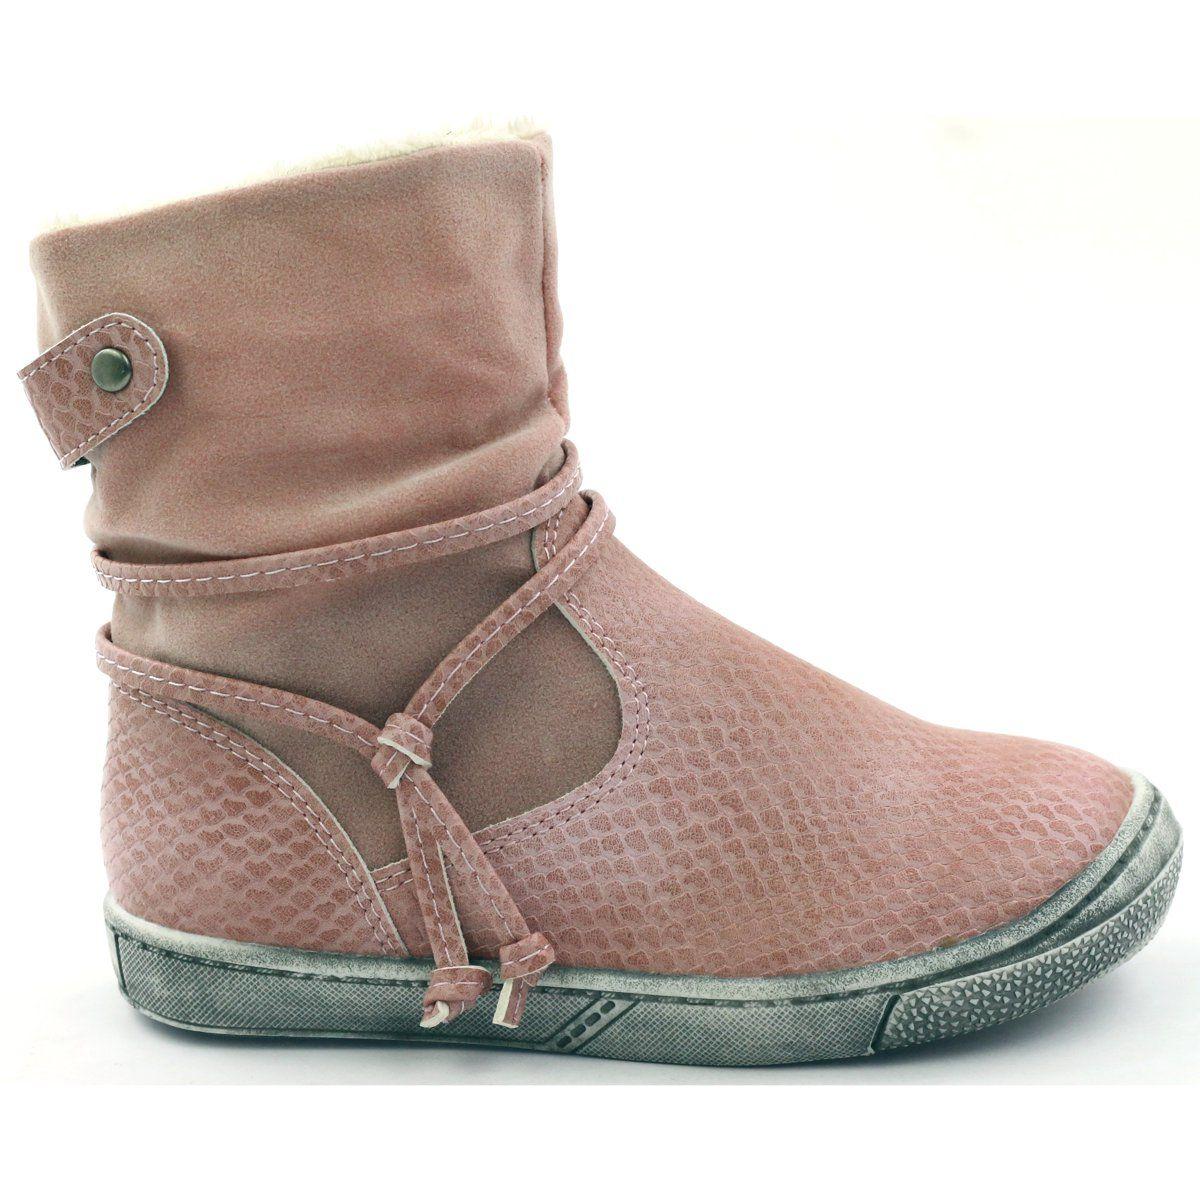 American Club Buty Zimowe Kozaczki Rozowe Na Suwak American16183 Boots Shoes Ugg Boots